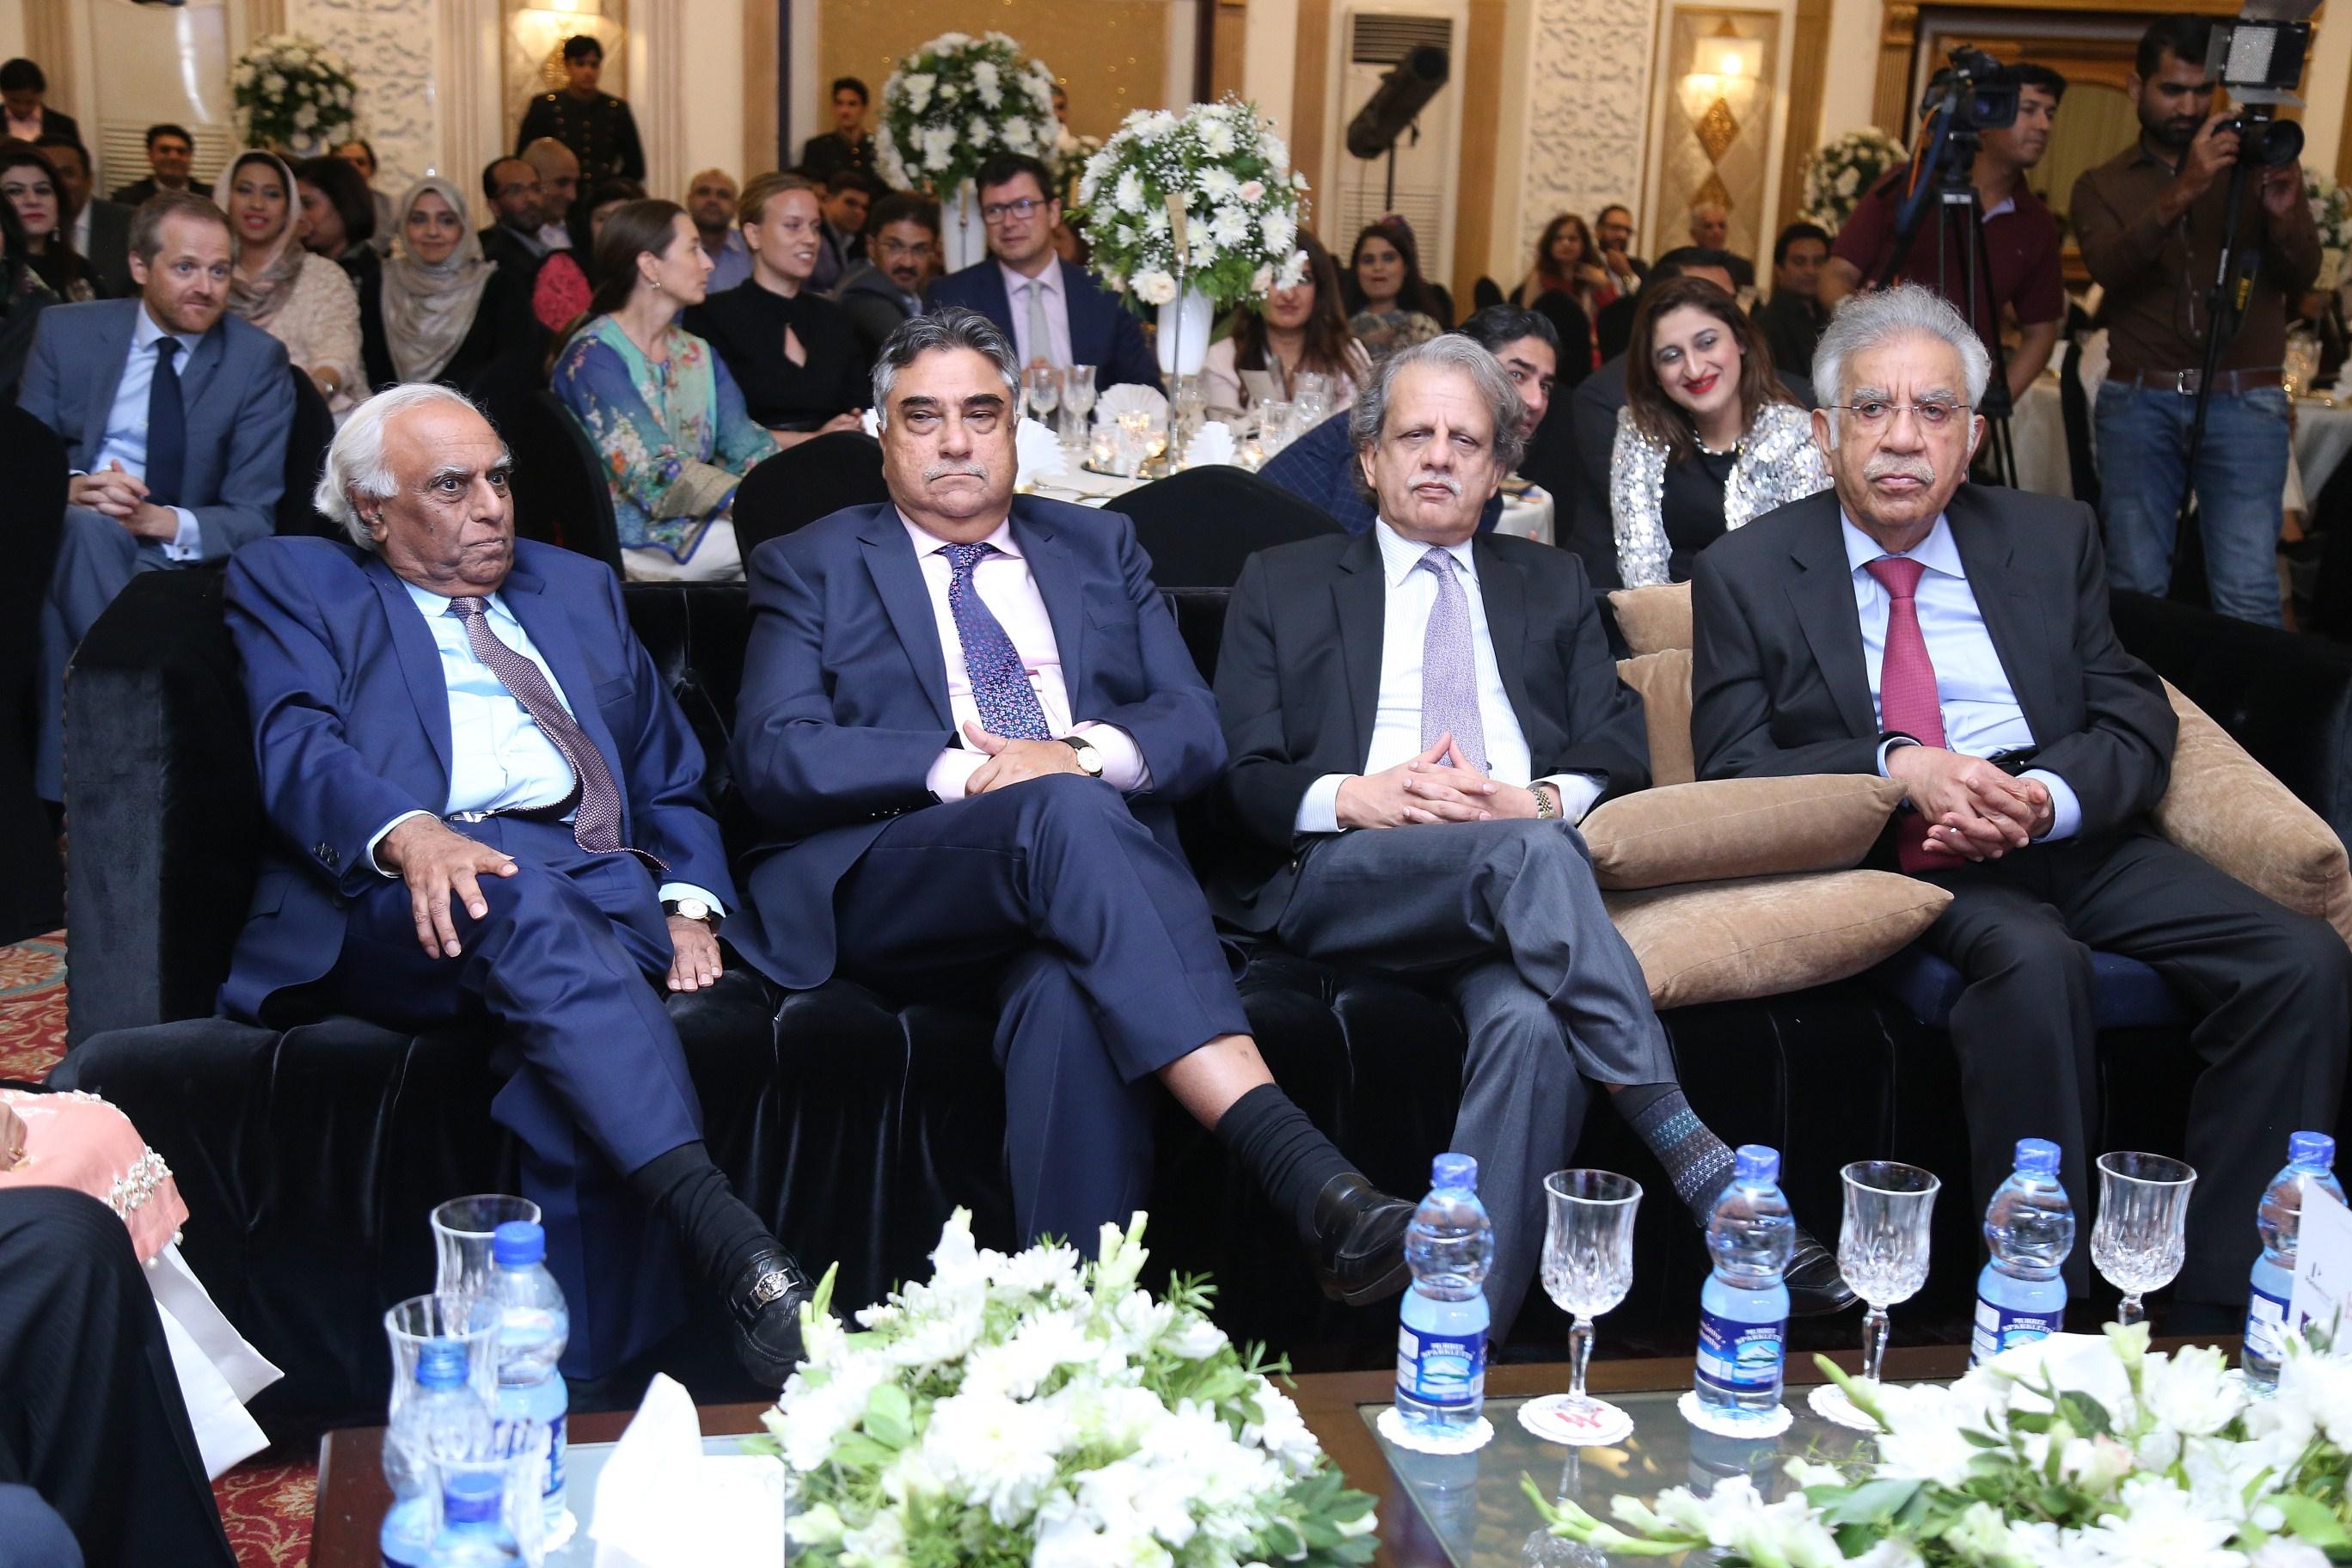 Dr Rashid Amjad, Justice Yawar Yaqub Ali, Azmat Saeed. Mr Sadrudin Hashwani